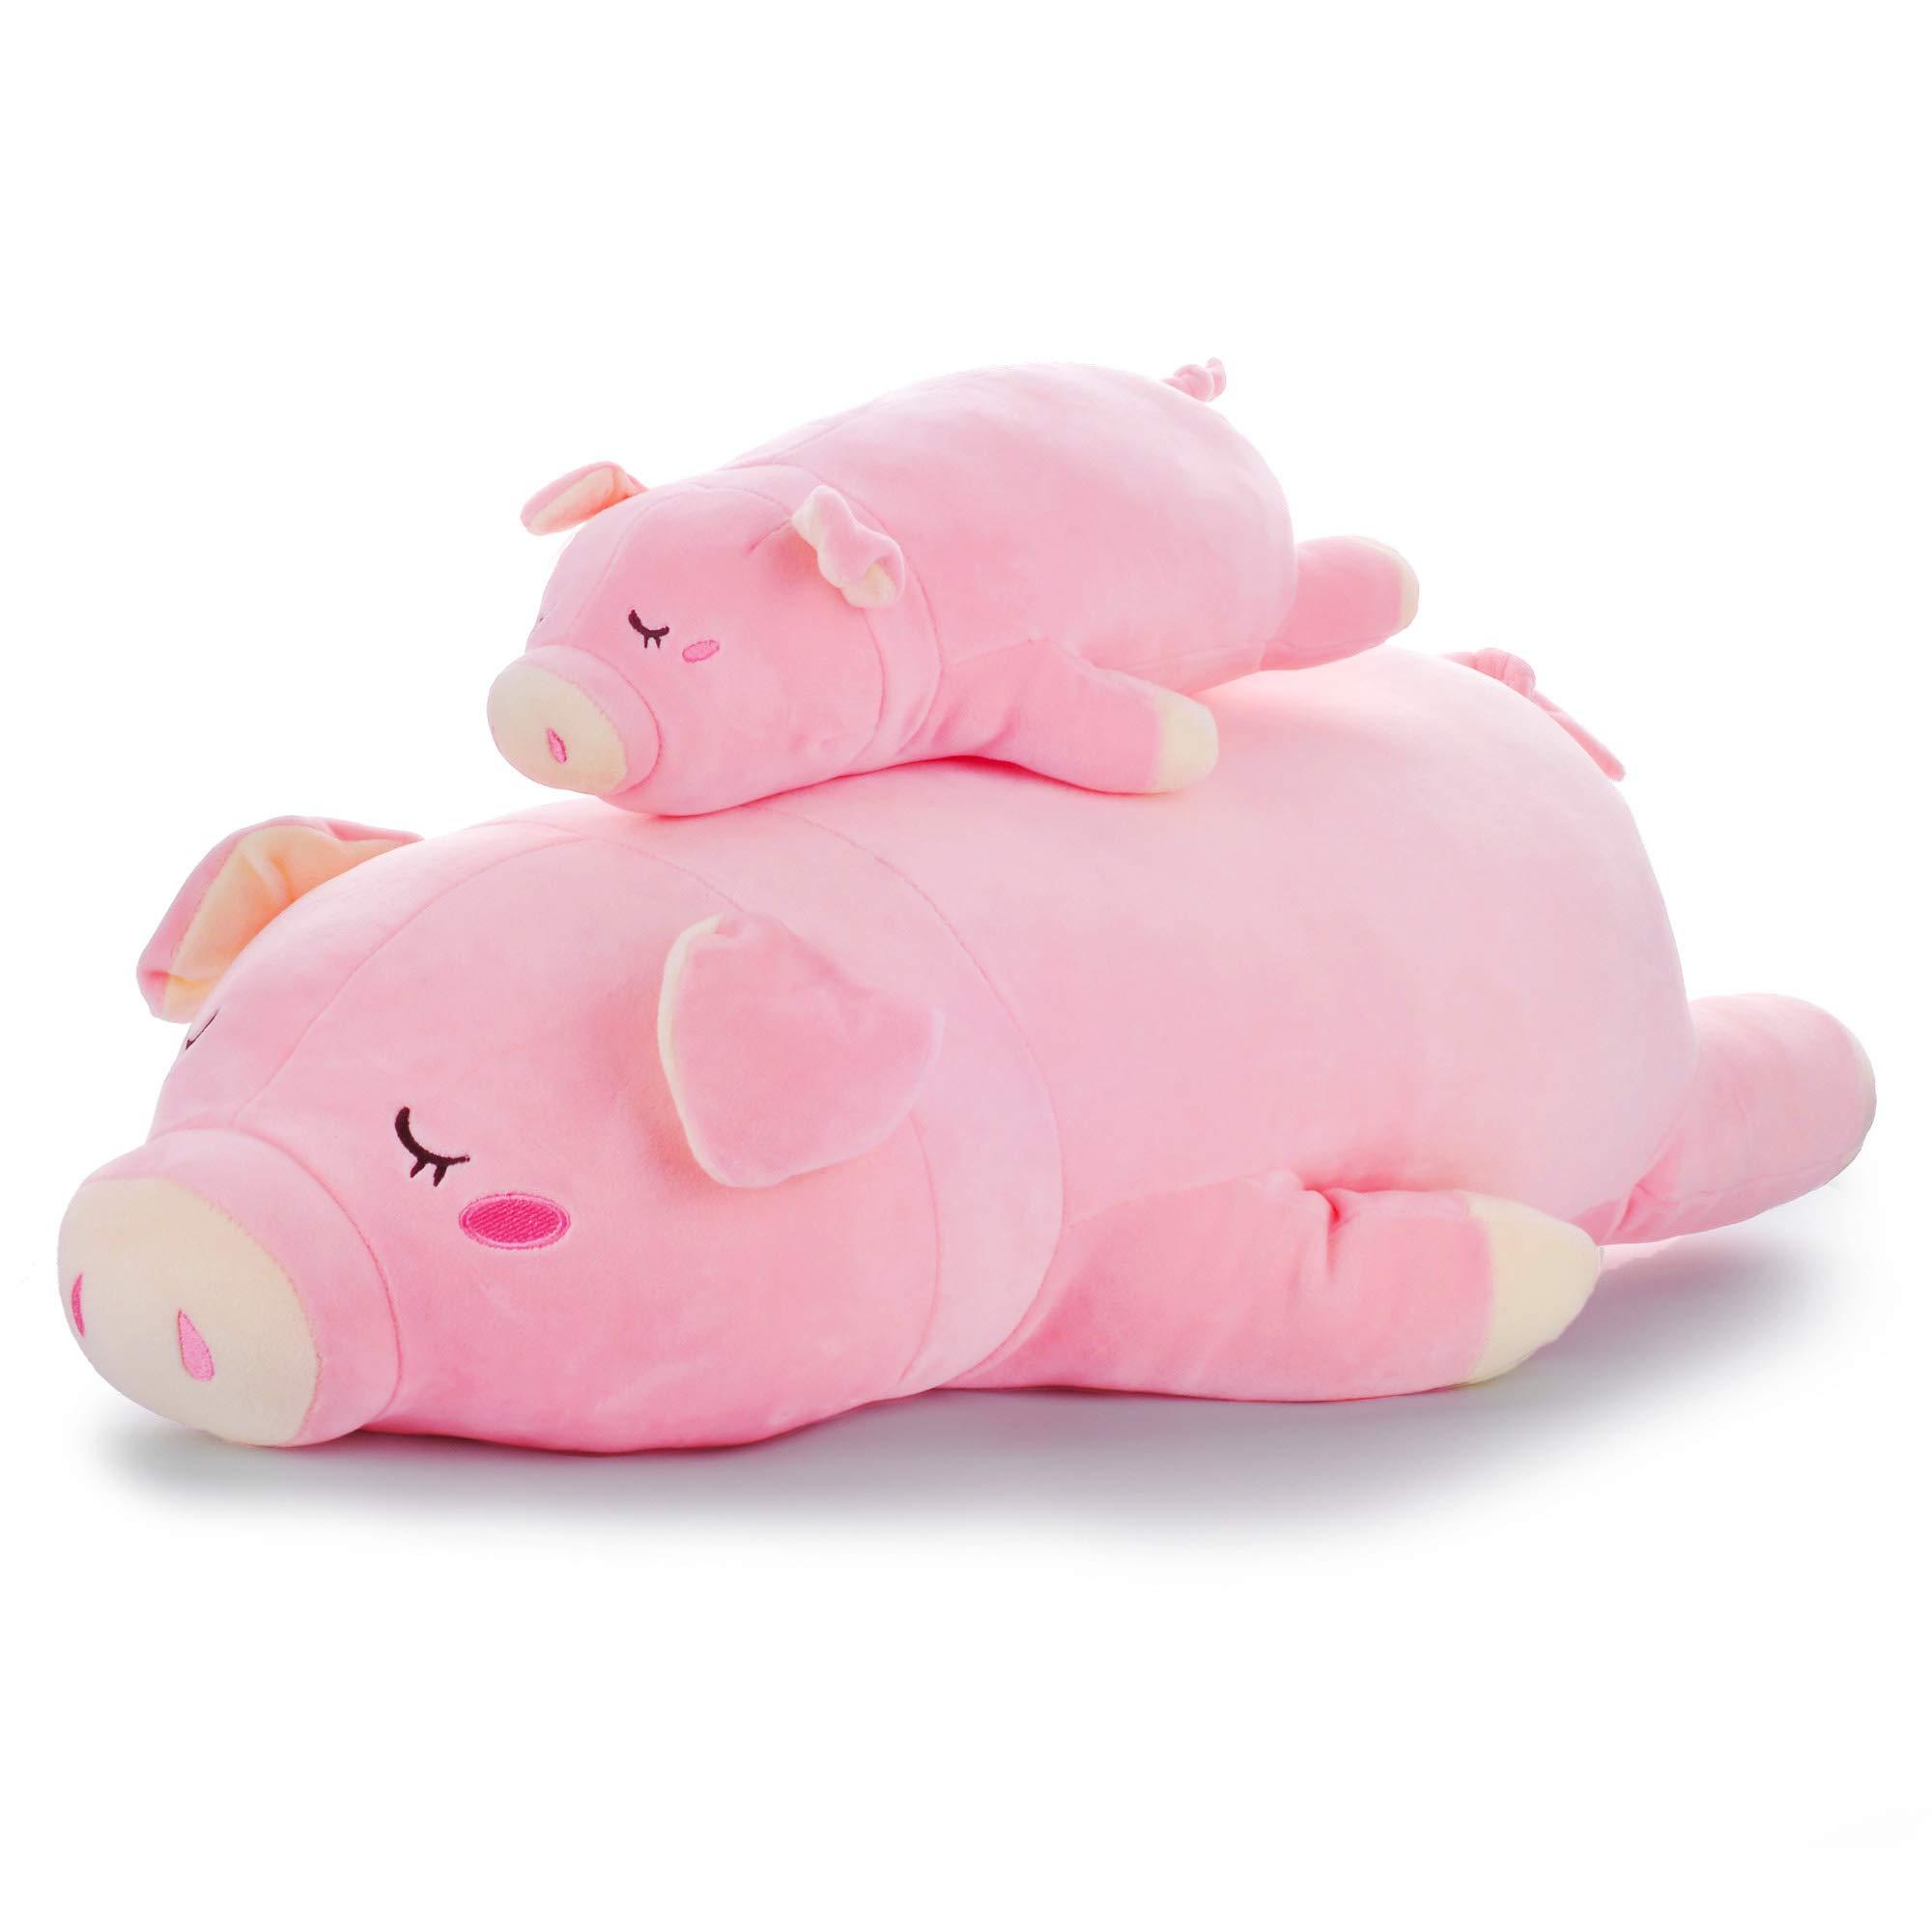 Lazada Plush Pig Stuffed Piggy Super Soft Hugging Pillows for Kids Toys Pink 25''(L)